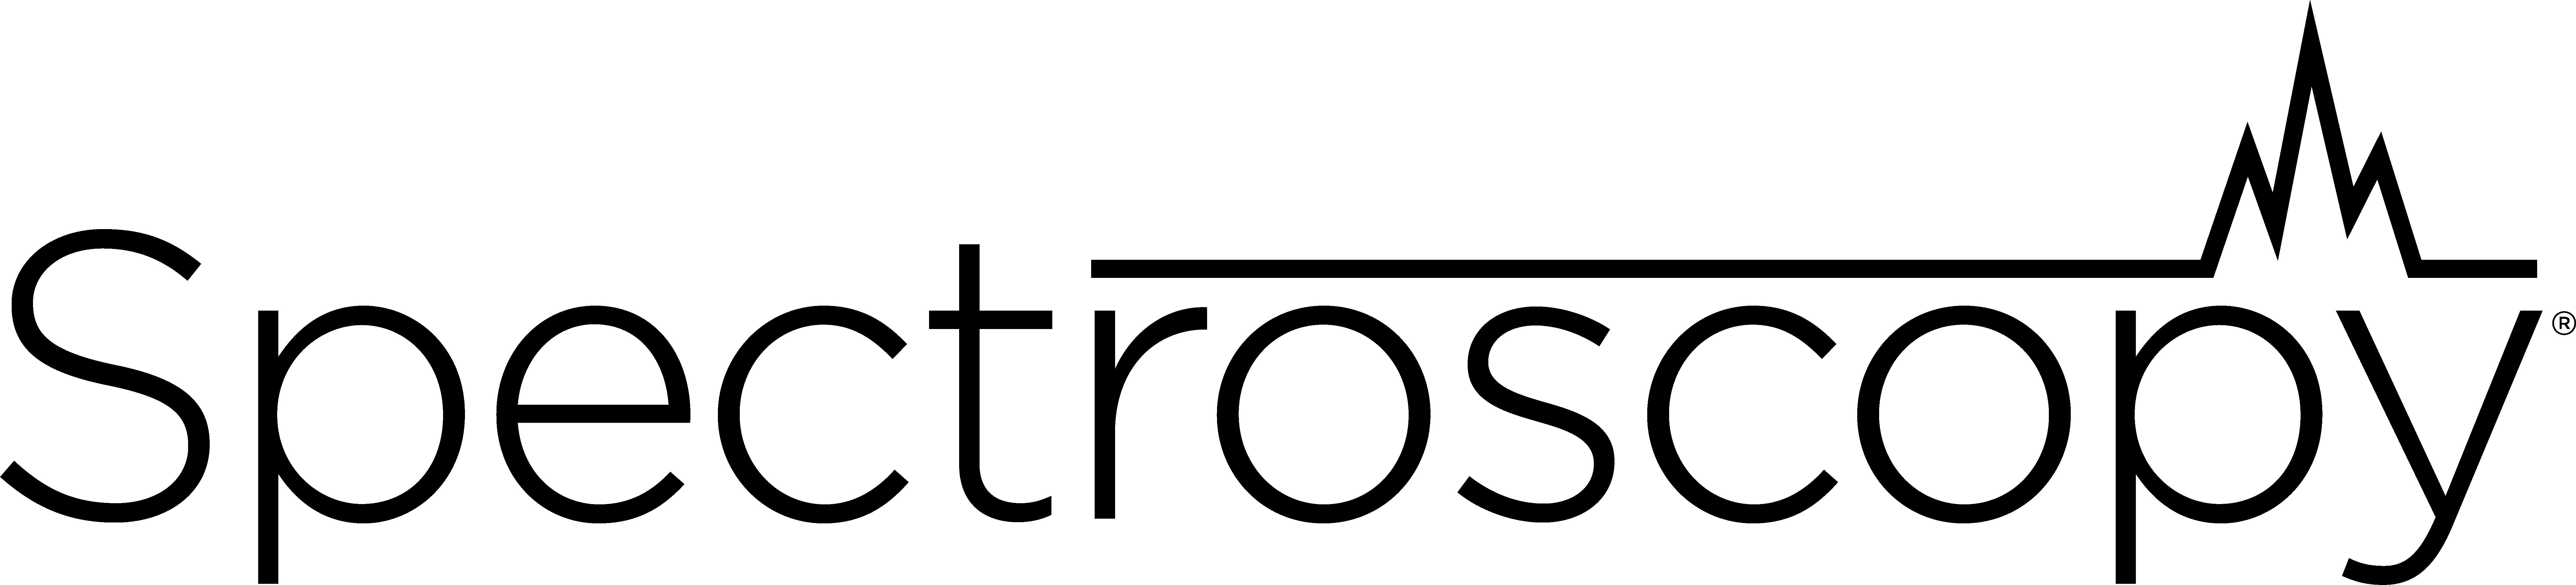 Spectroscopy logo